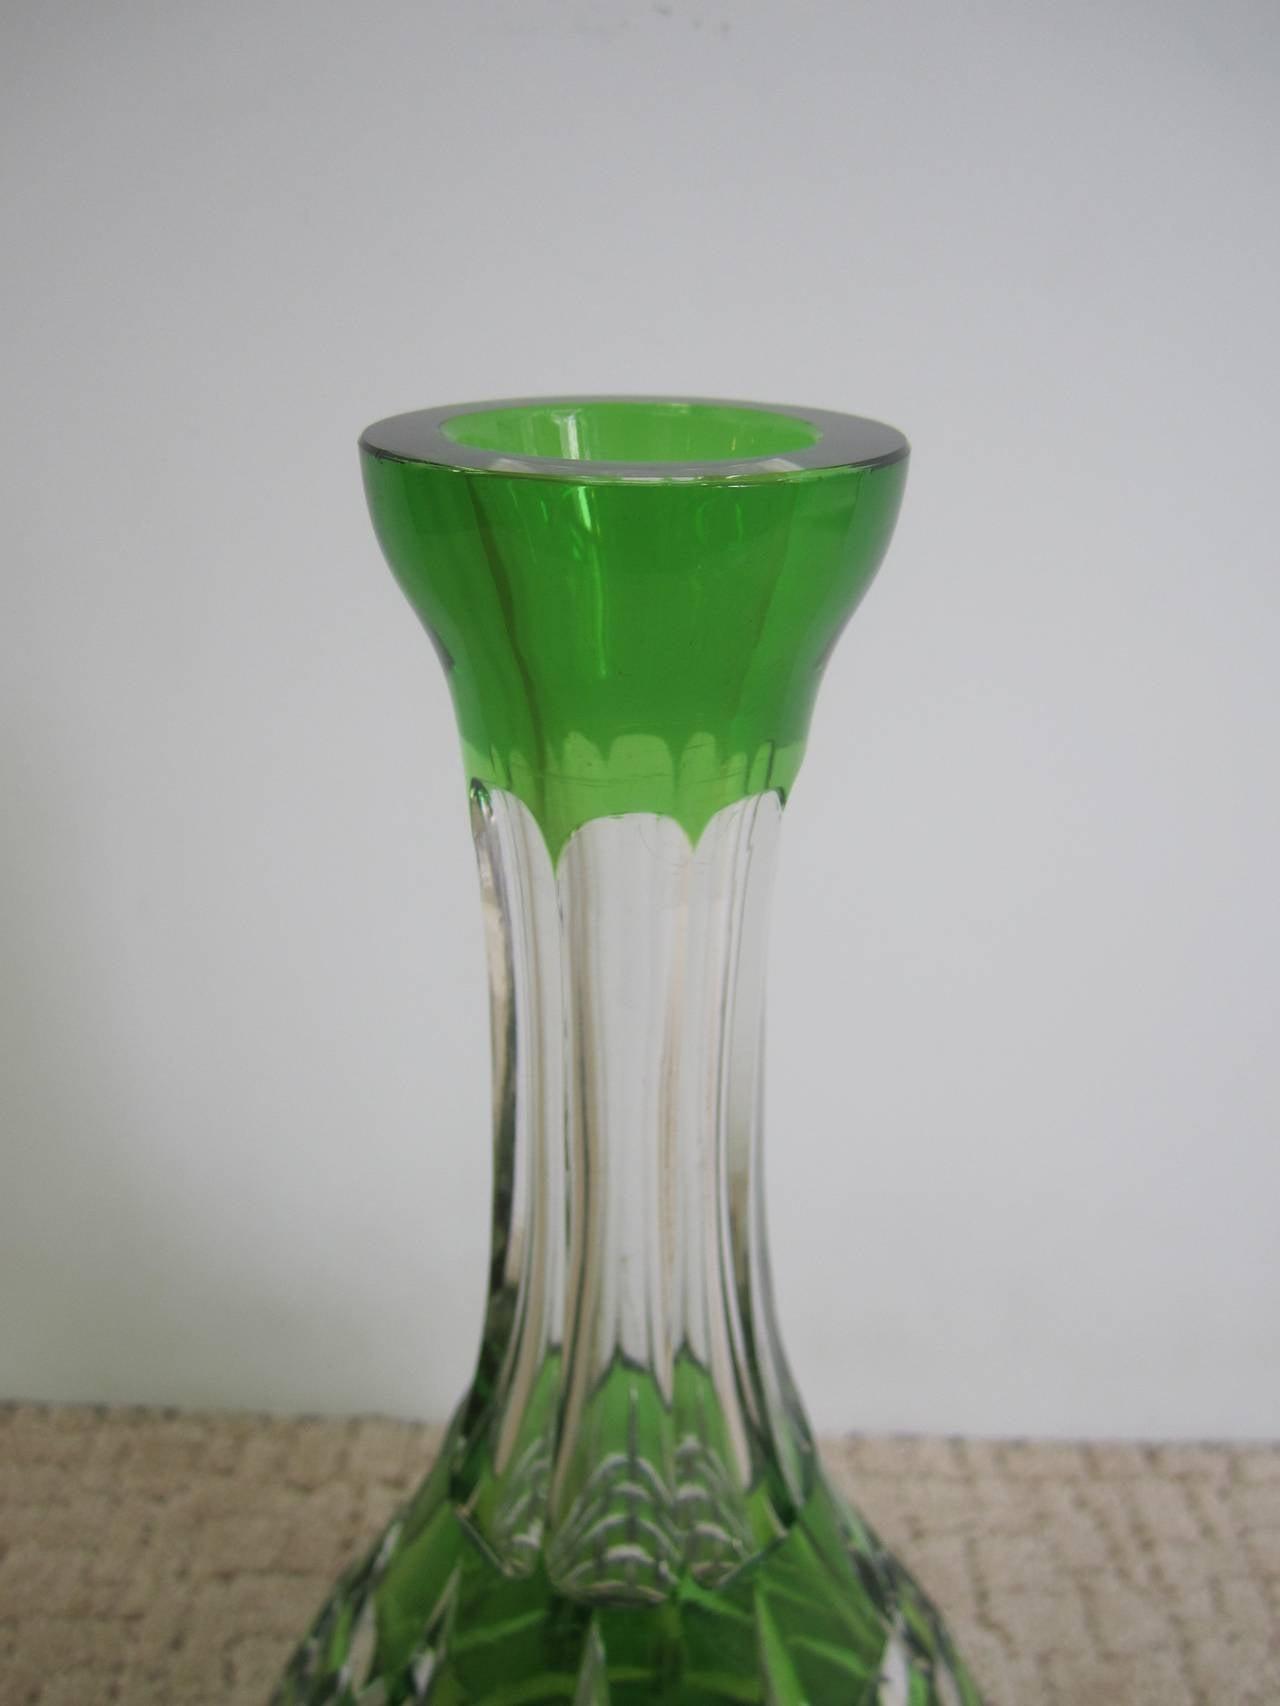 European Val St. Lambert Style Emerald Green Crystal Liquor Decanter For Sale